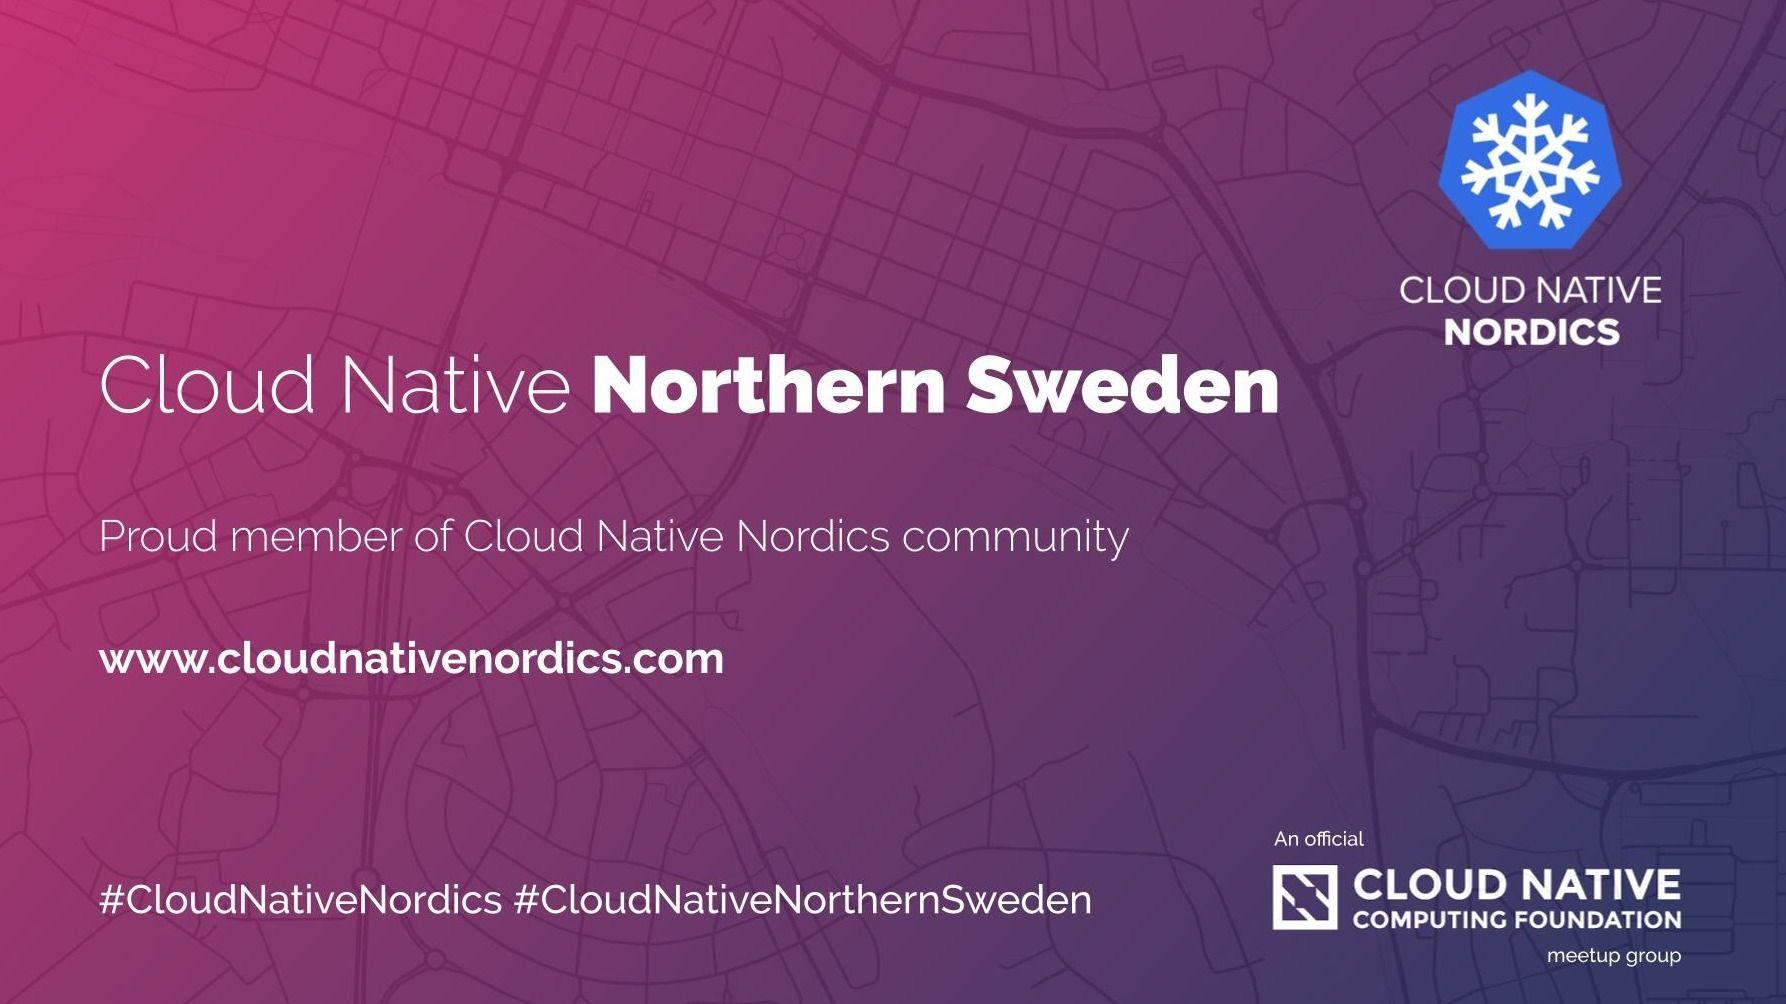 Cloud Native Northern Sweden